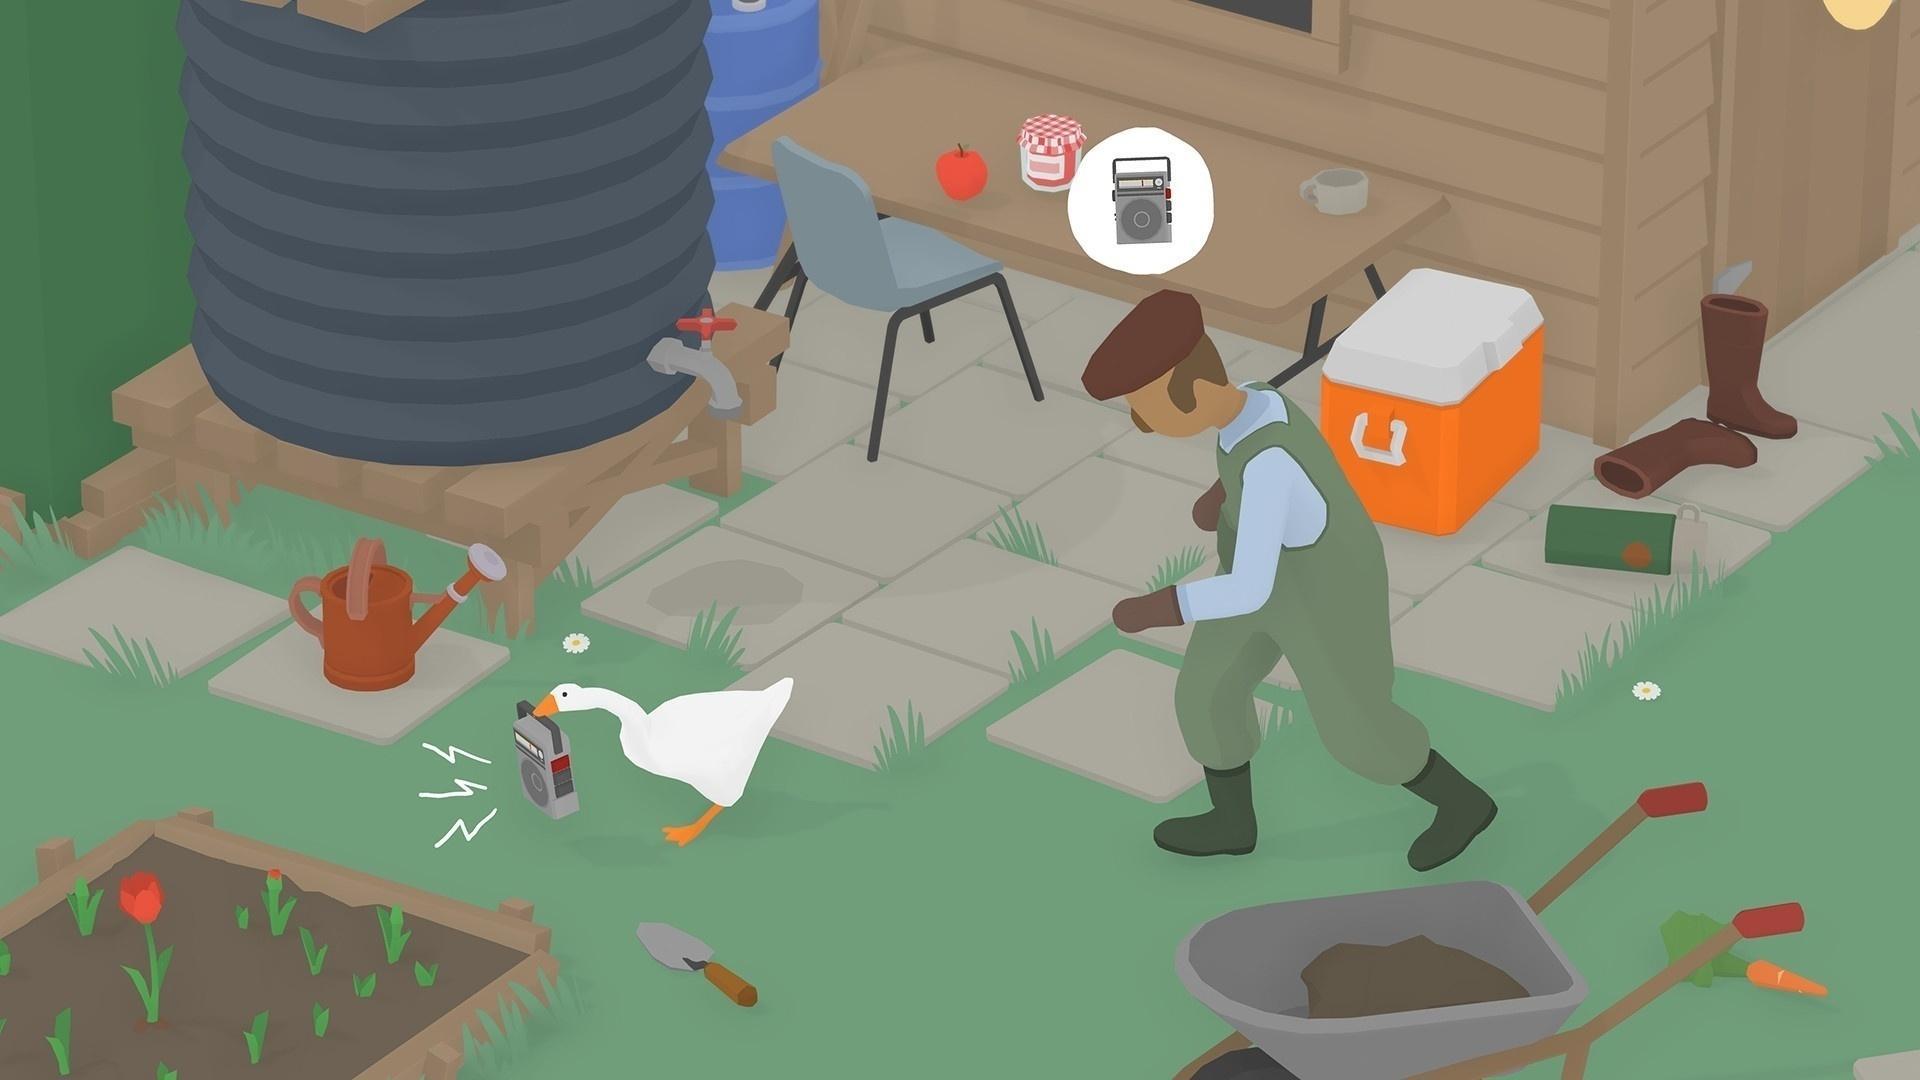 untitled-goose-game-1575903198472_v2_1920x1.jpg